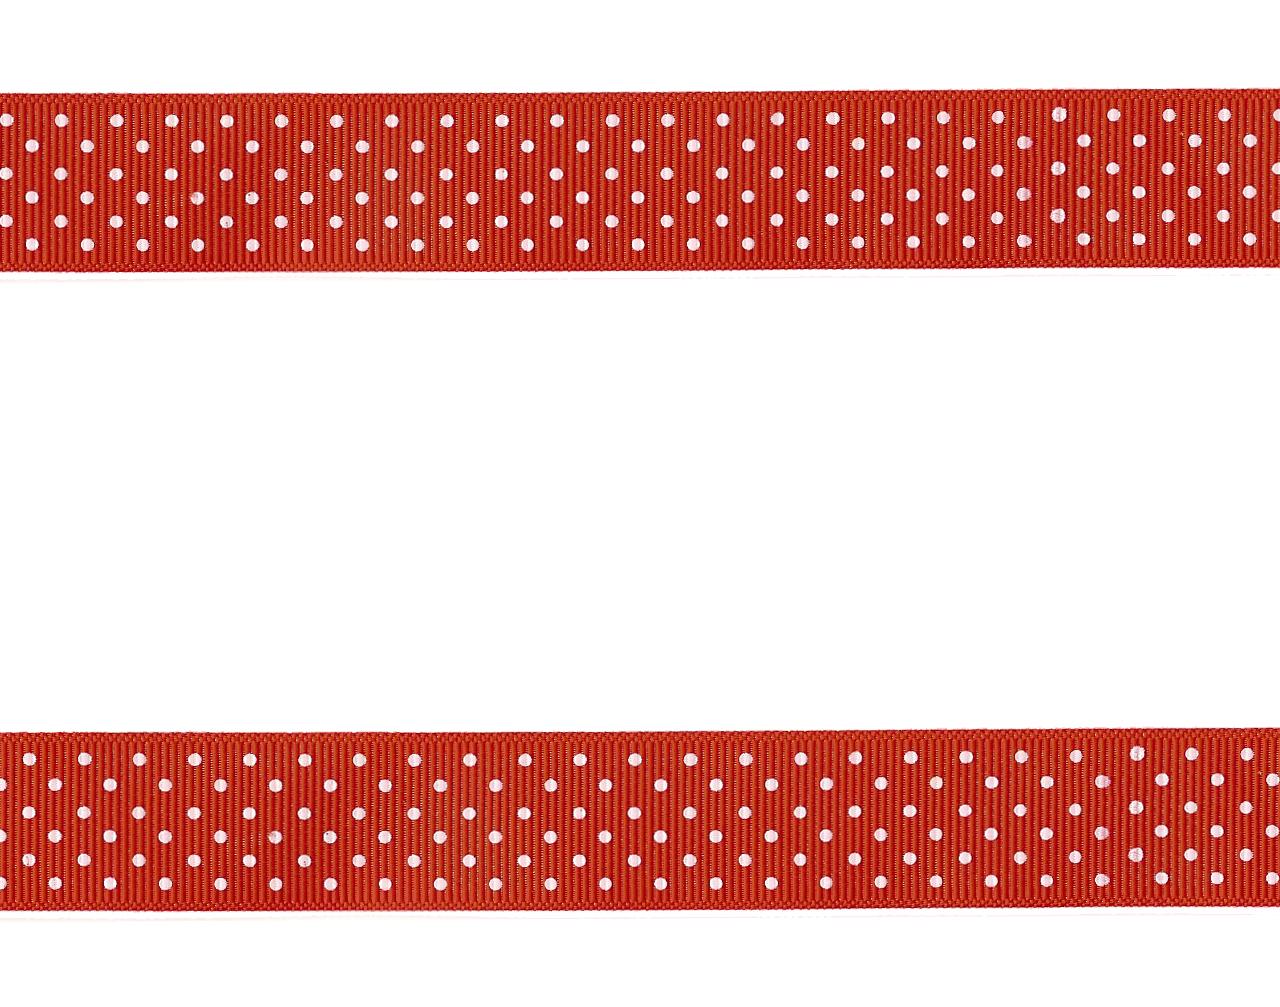 Red Polka Dot Border Free Free Download Clip Art.